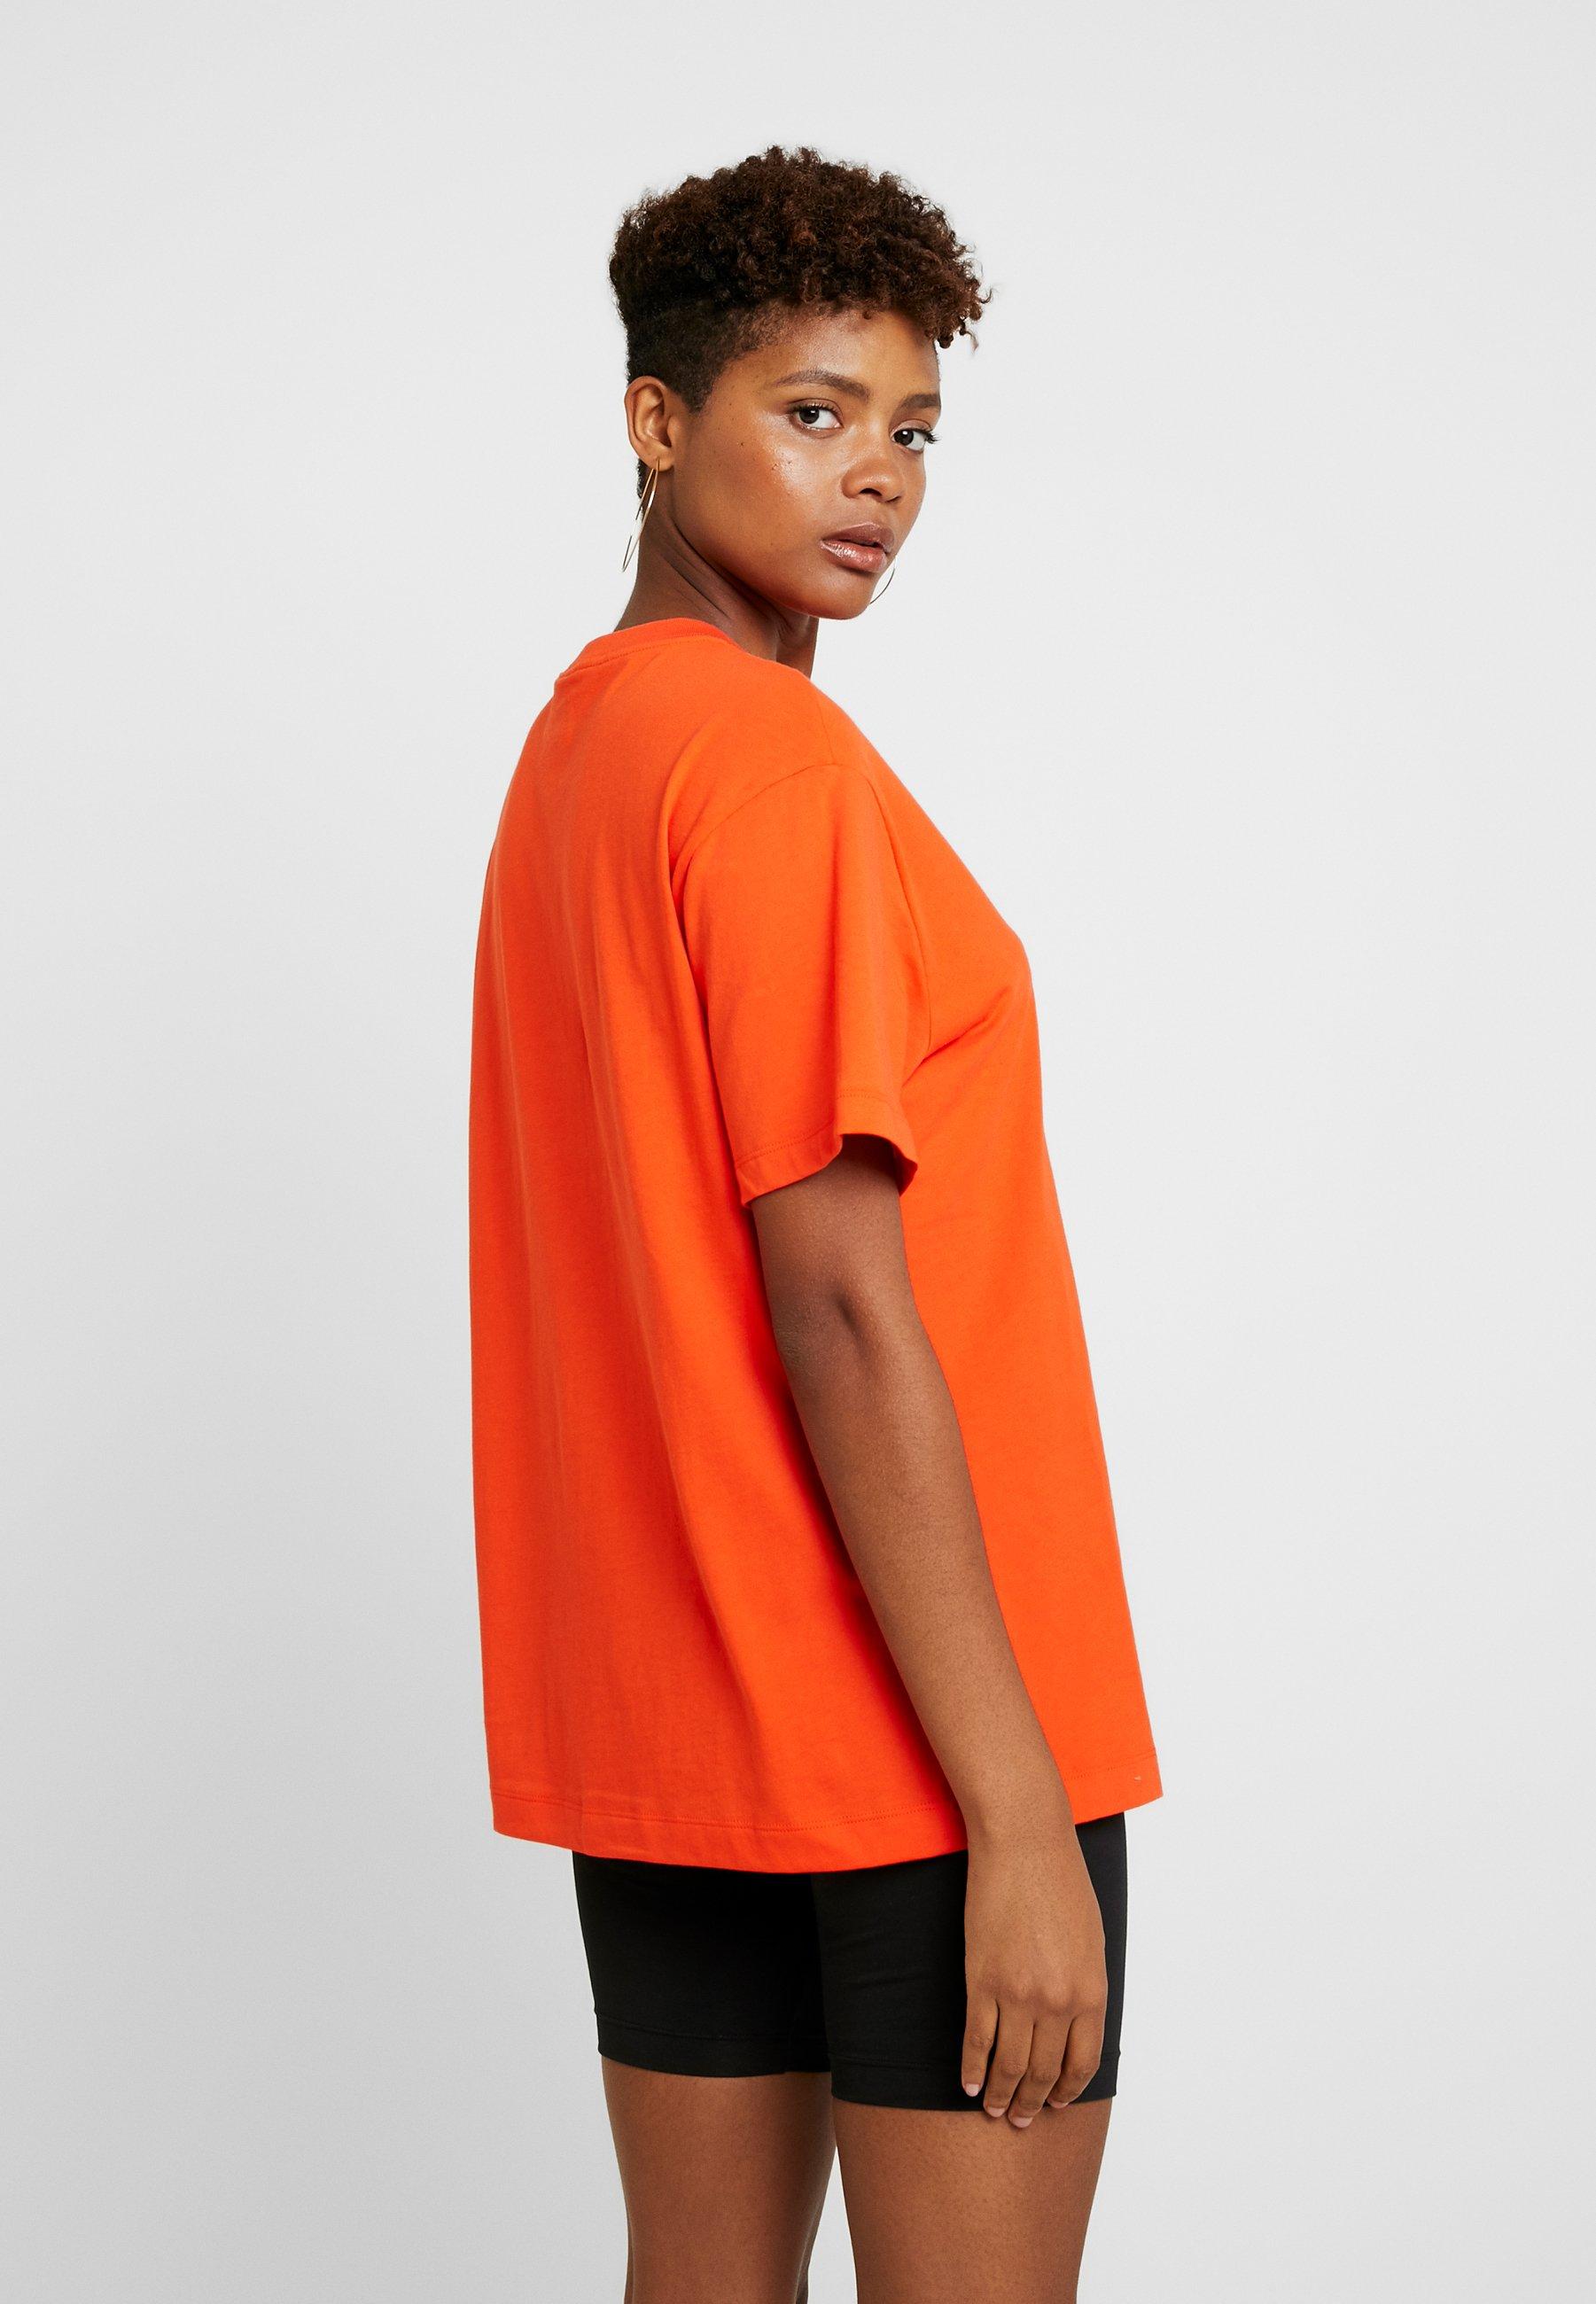 basique Nike Sportswear orange white team T shirt bv76IgyYfm